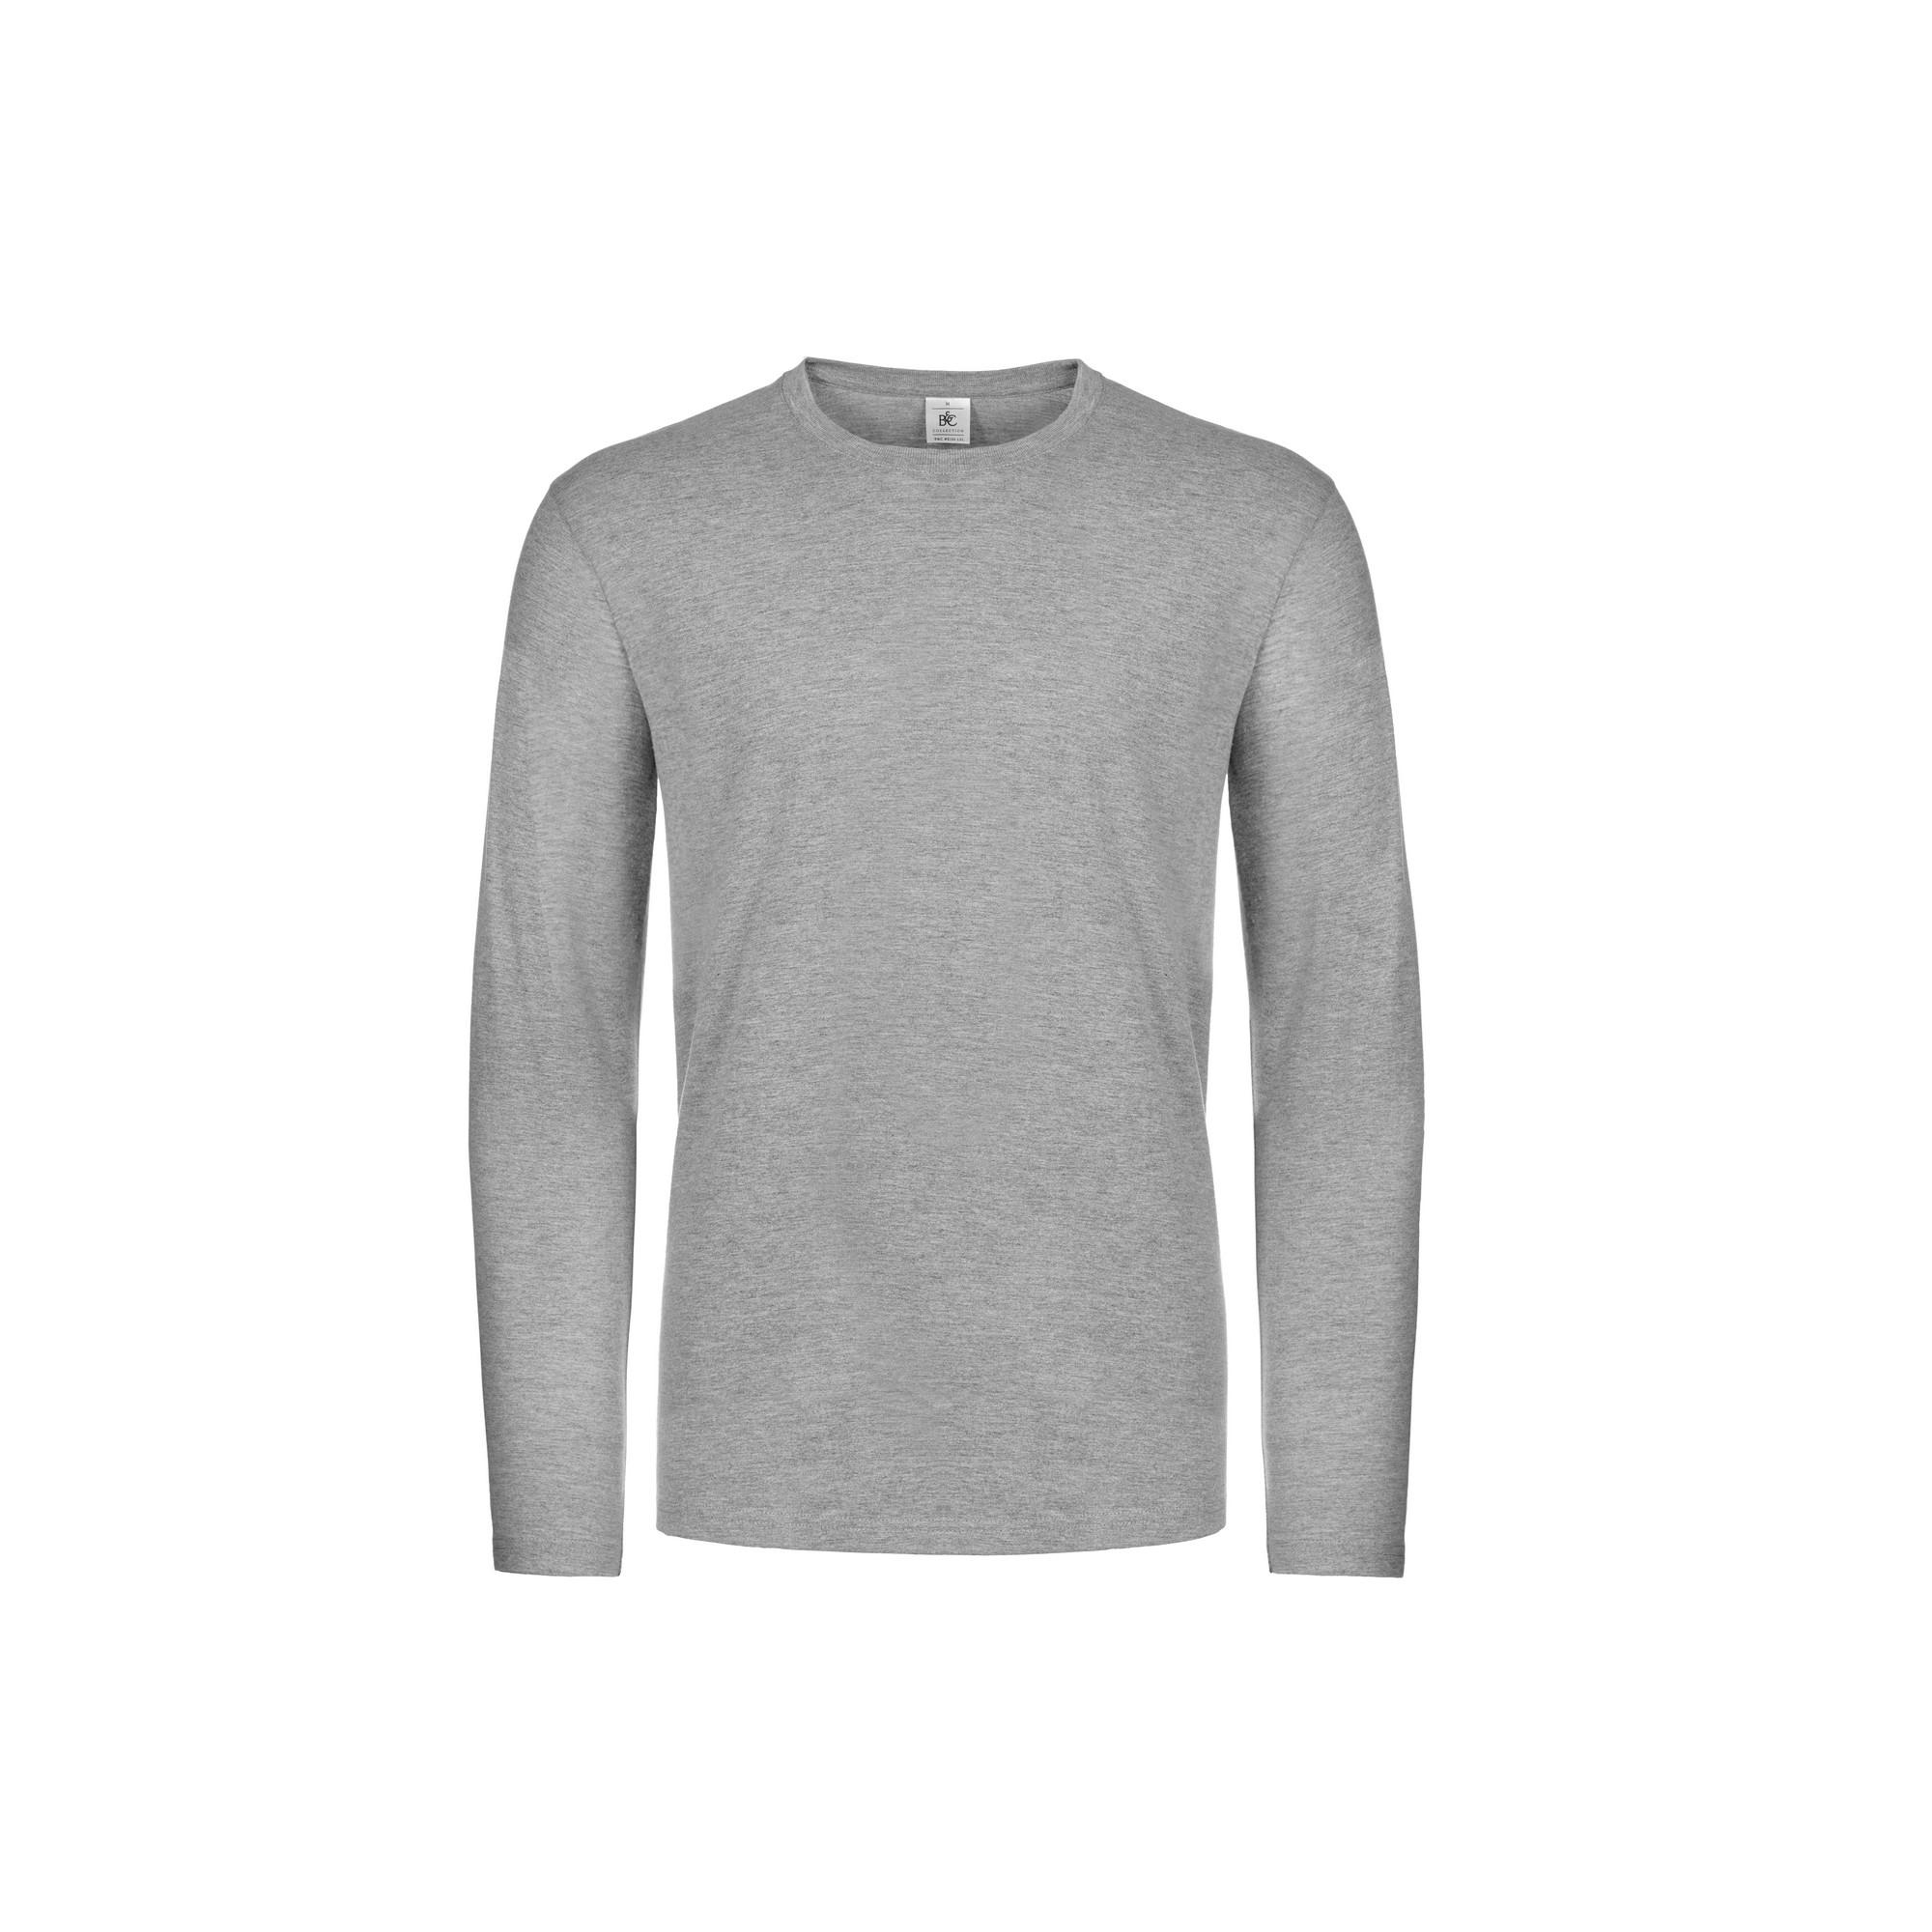 B&C Mens #E190 Long Sleeve T-Shirt (XL) (Sport Grey)